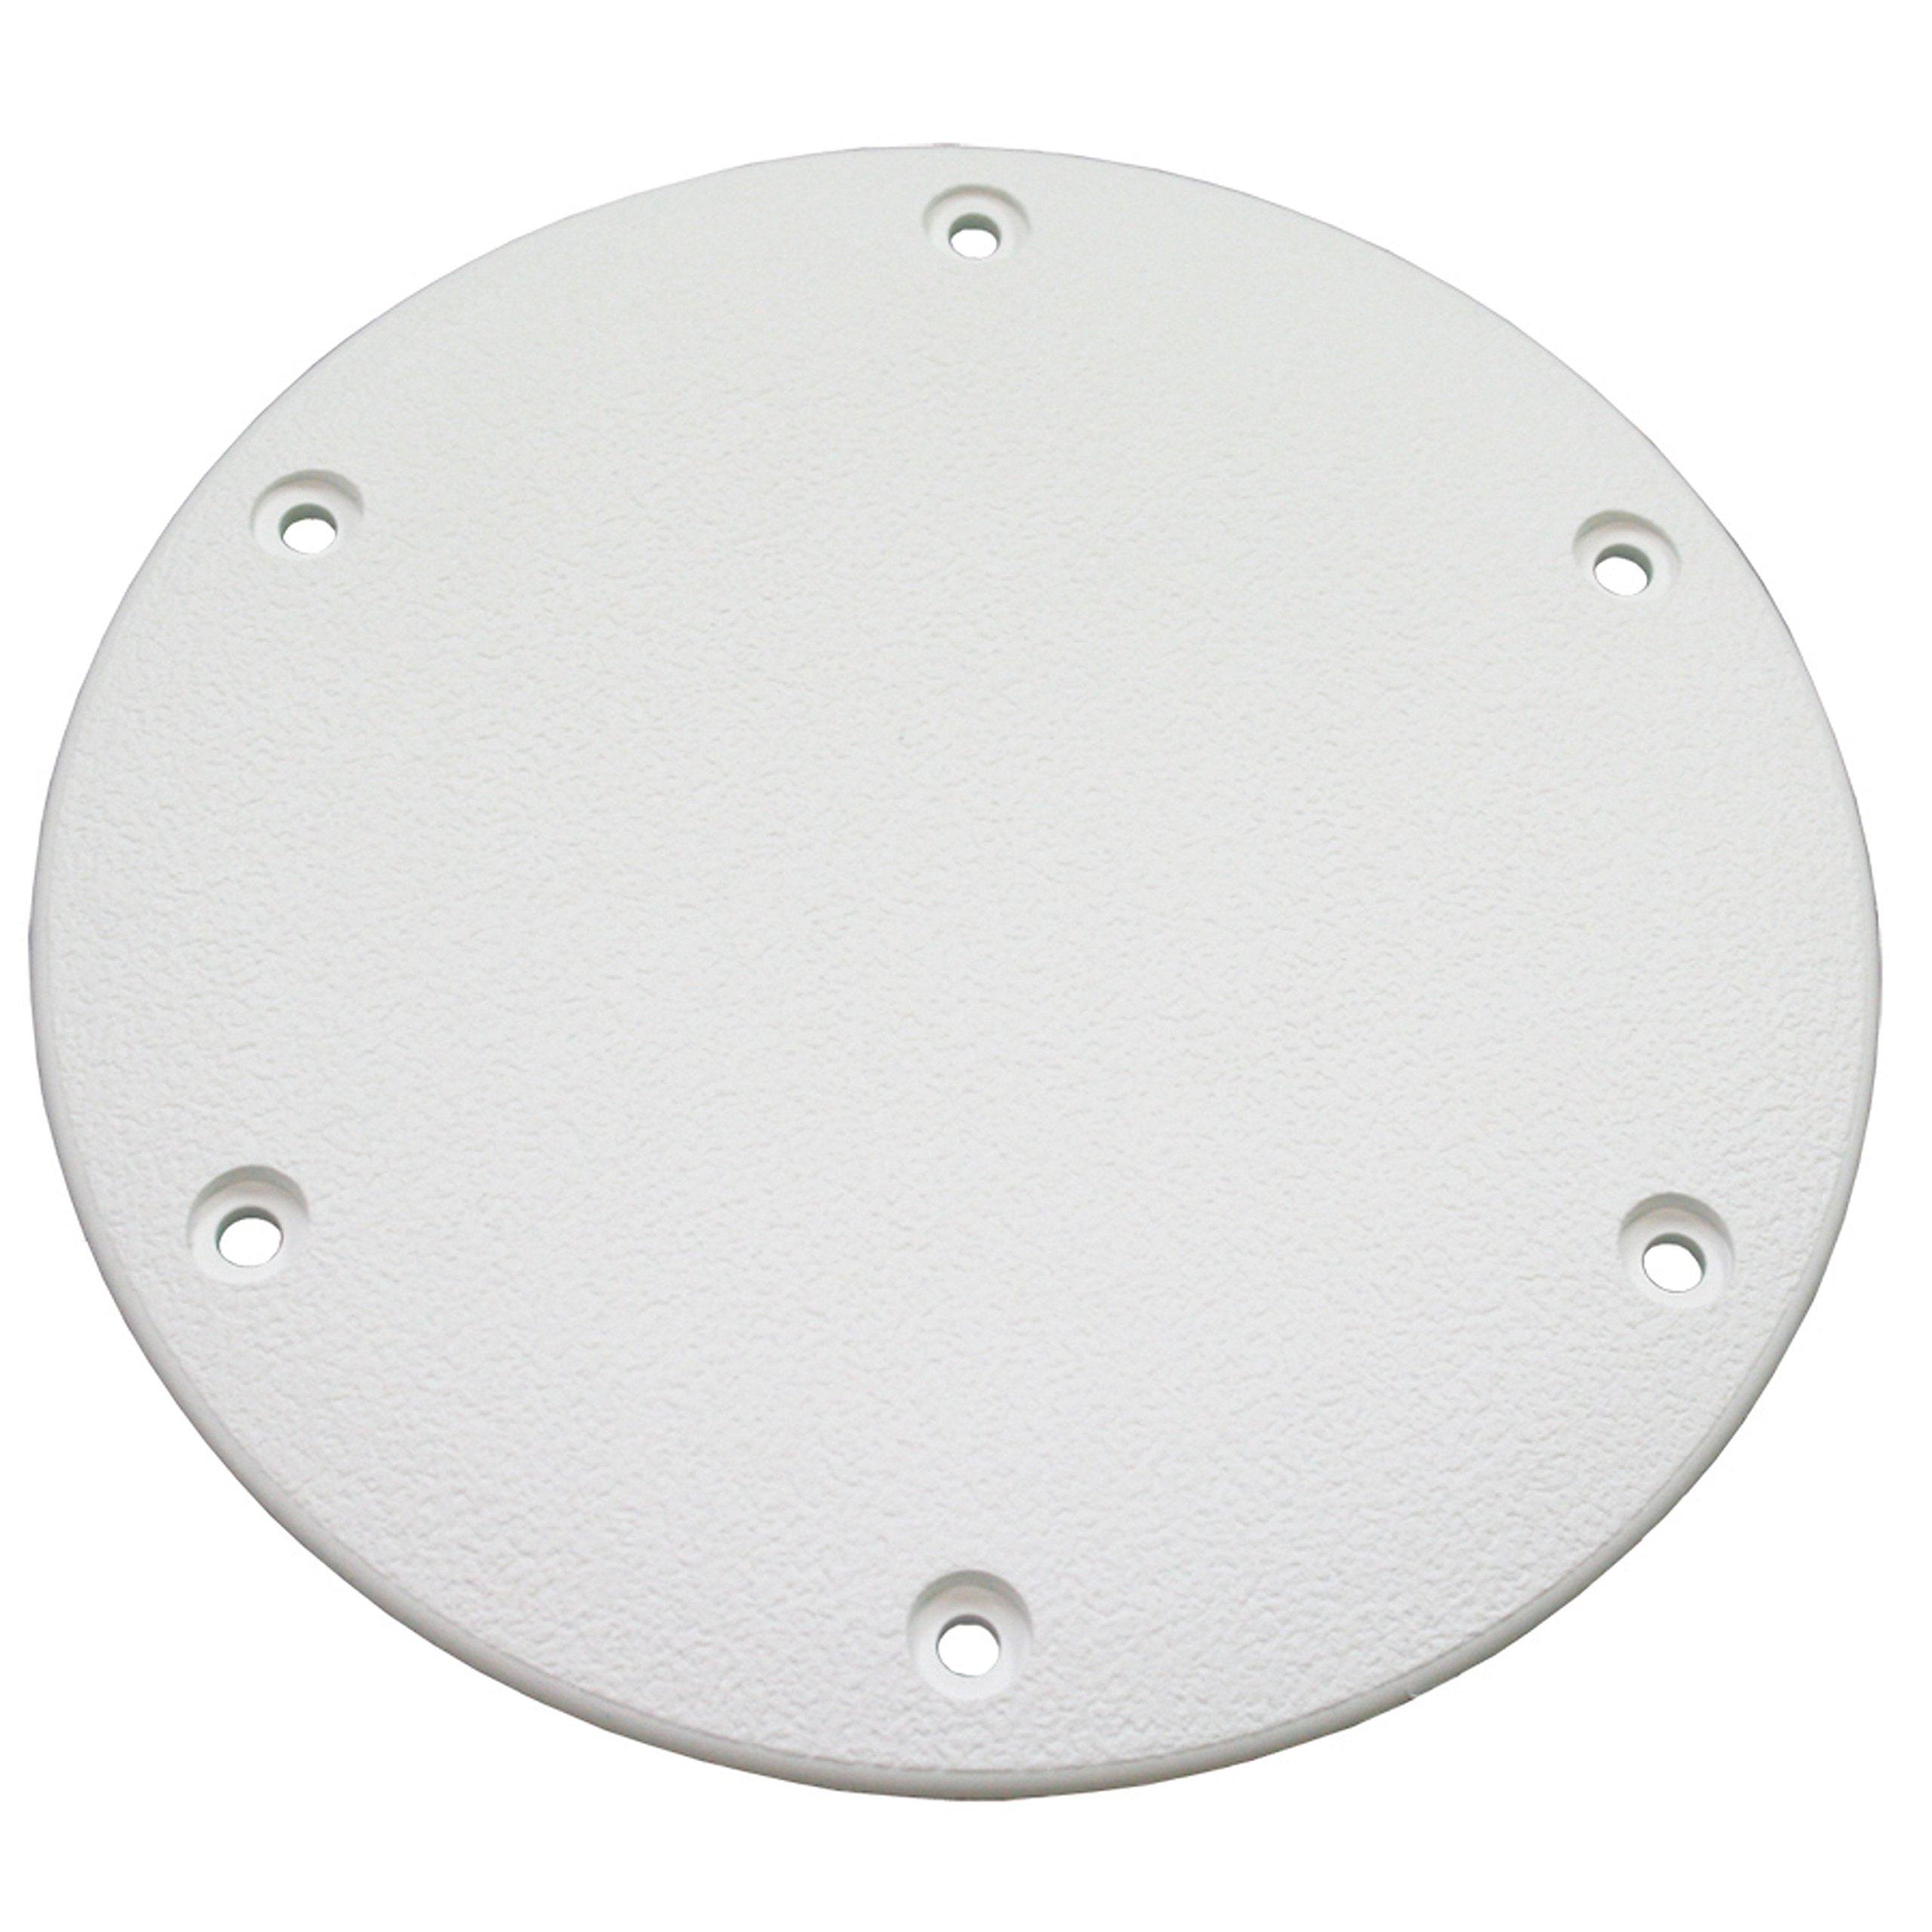 T-H Marine DSSDP-2-2-DP Designer Series Screw Down Deck Plates, 8'' - White